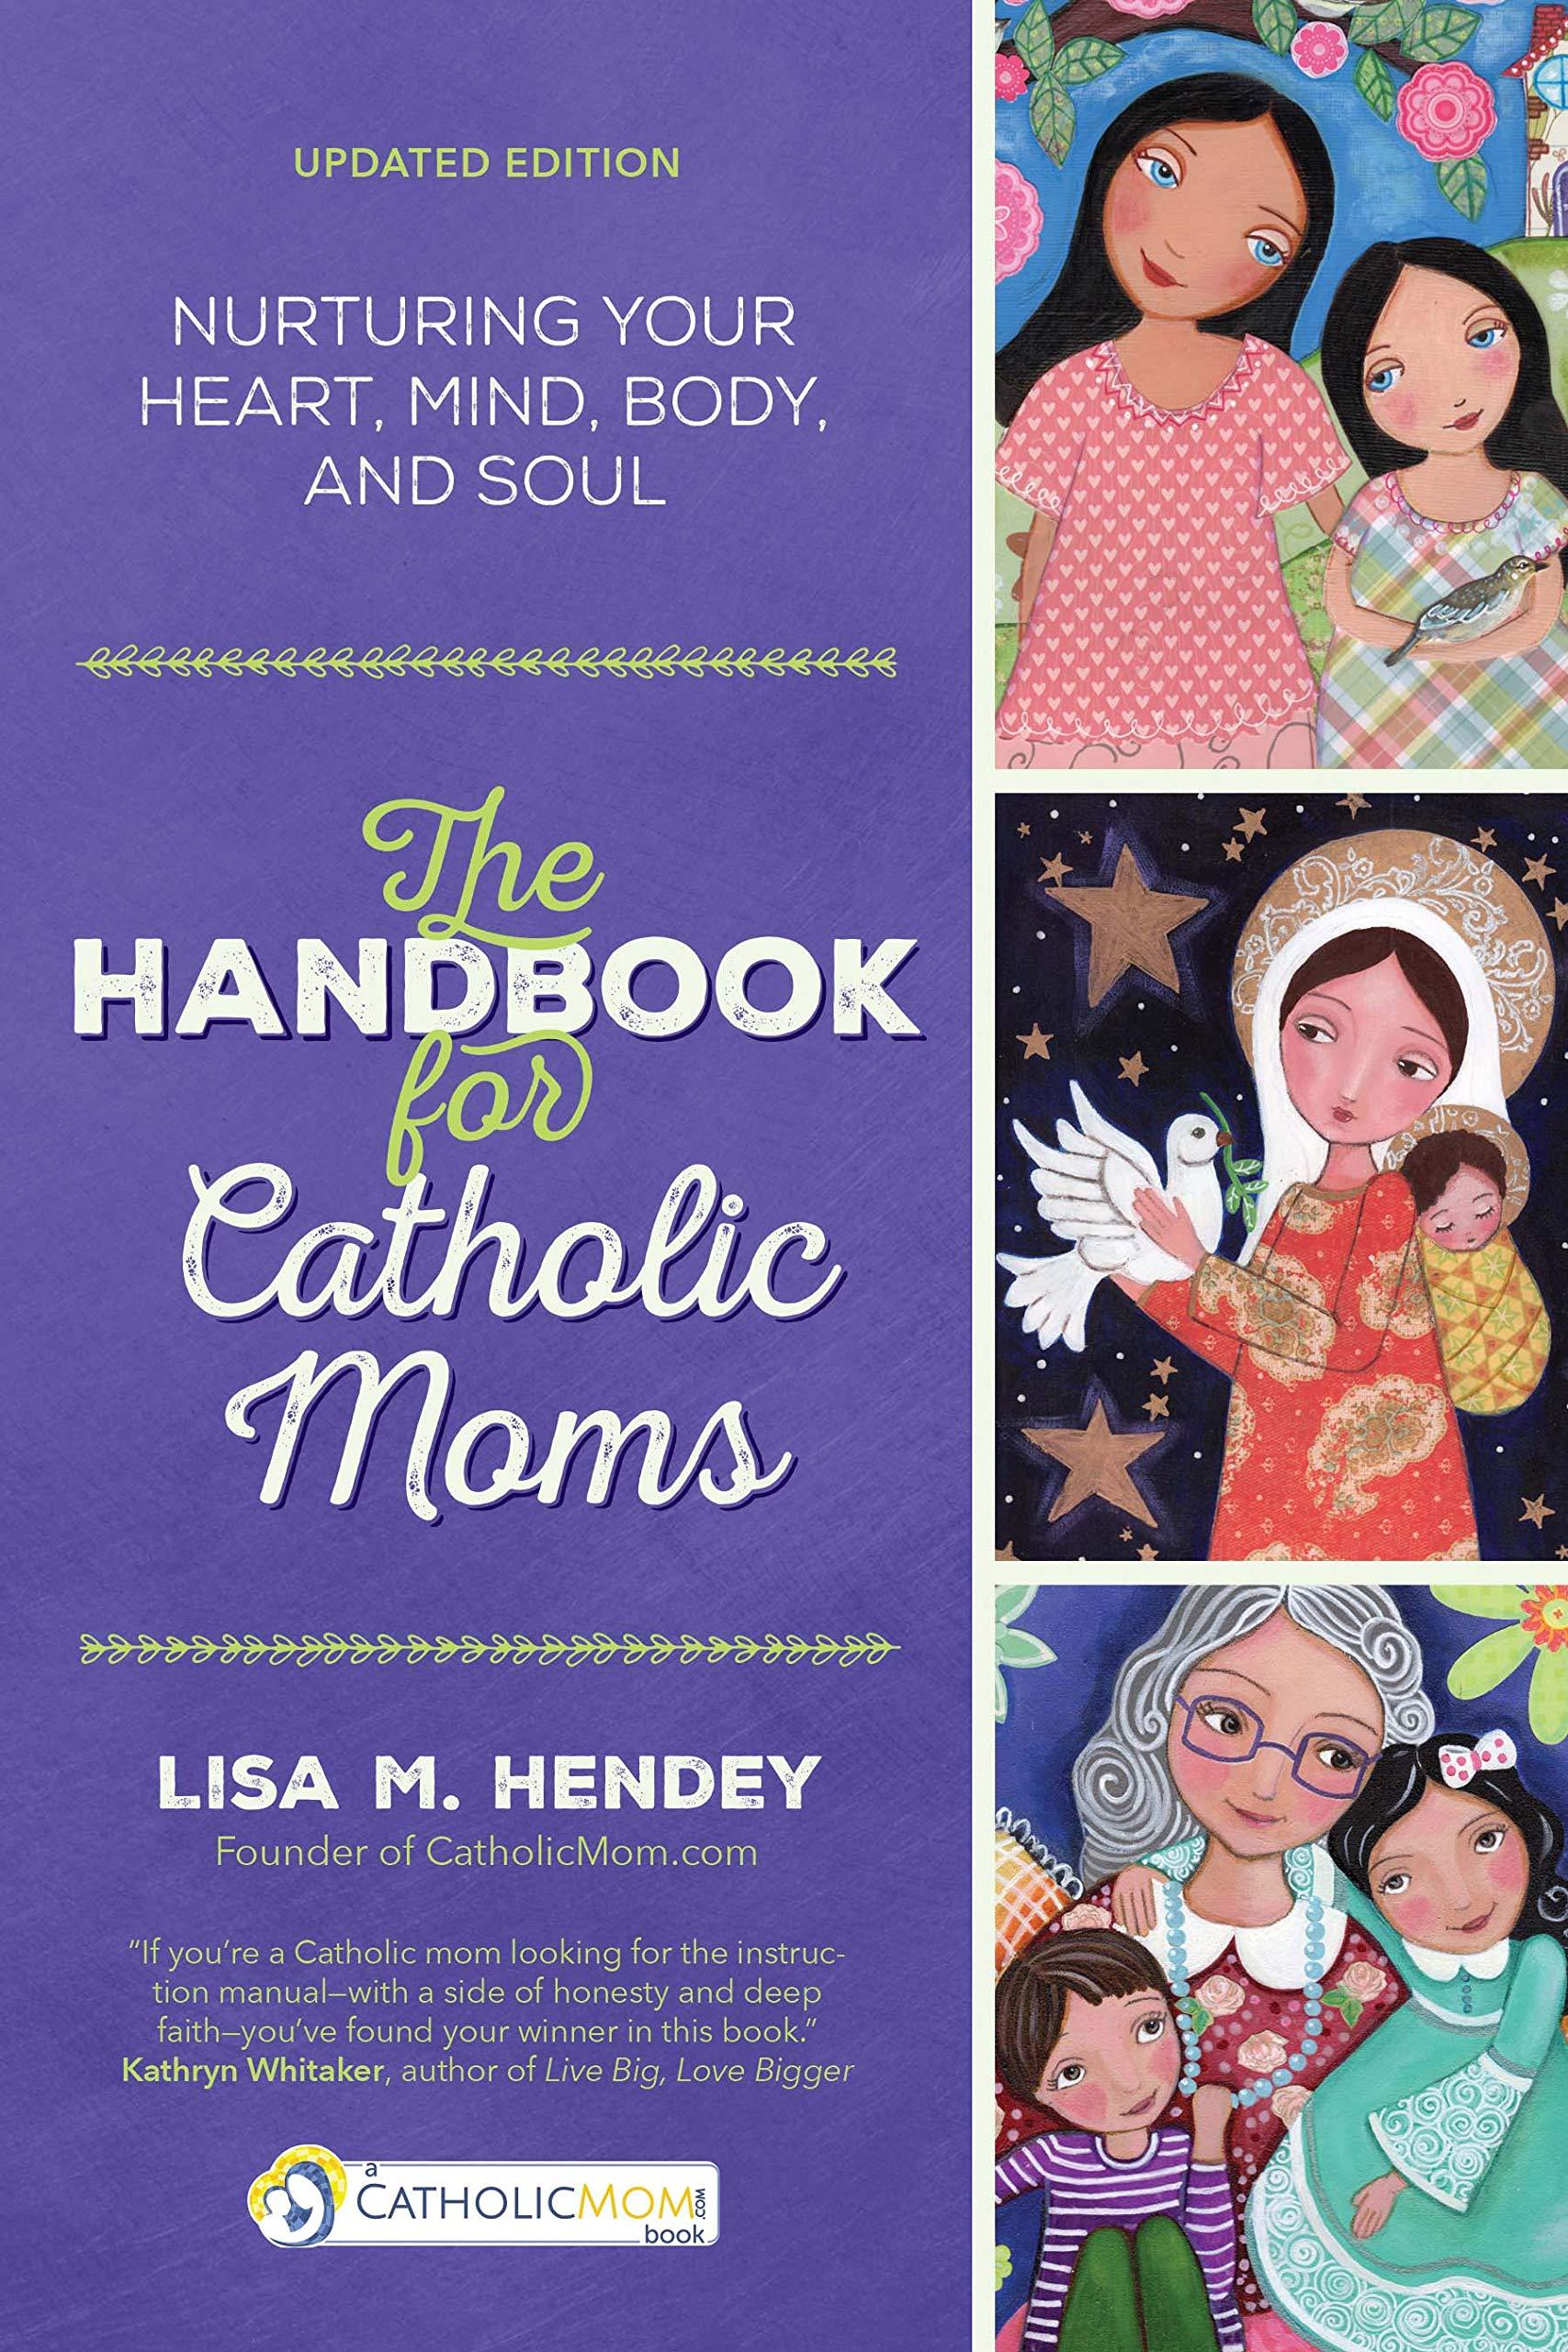 The Handbook for Catholic Moms: Nurturing Your Heart, Mind